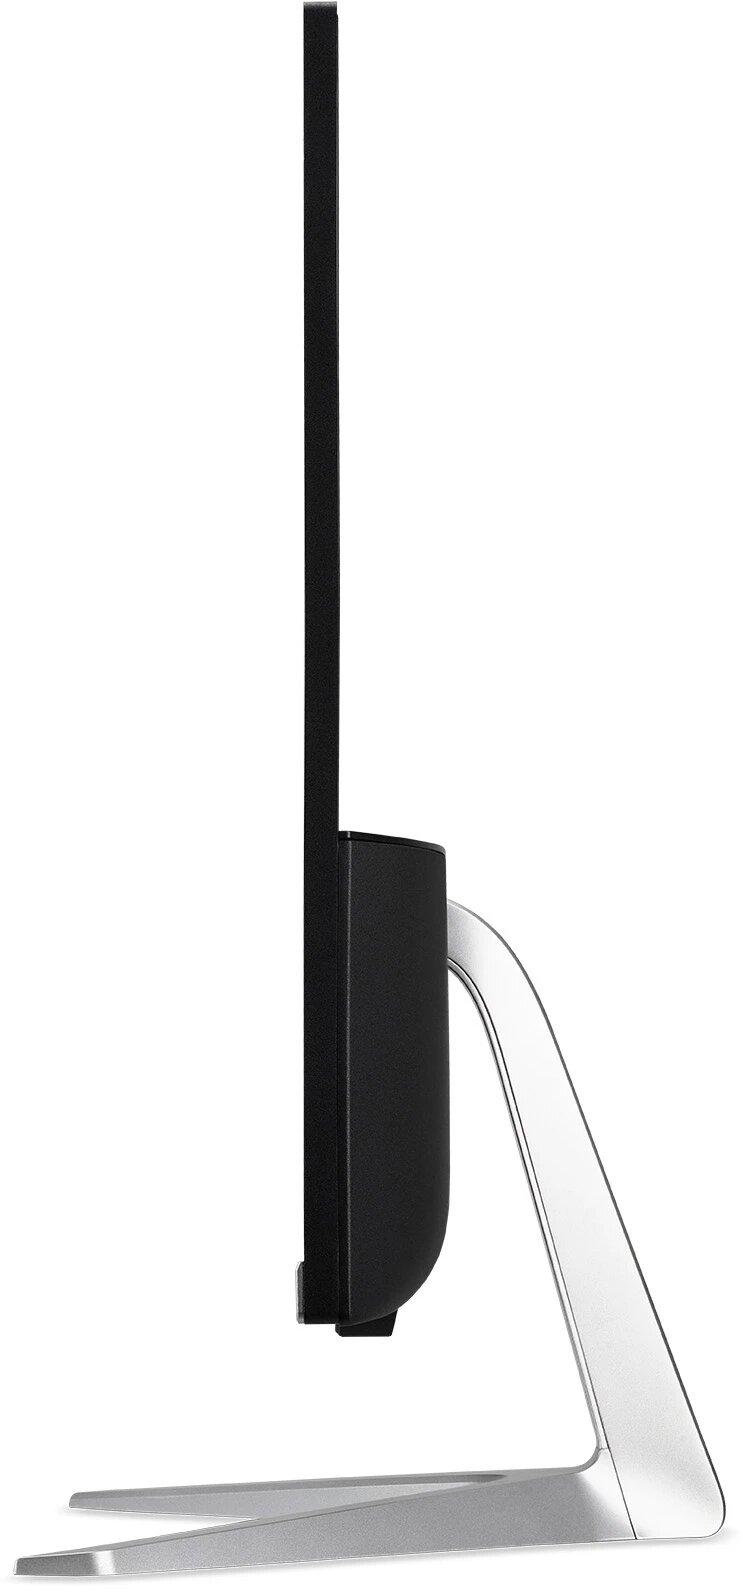 Моноблок Acer Aspire C24-963 (DQ.BERMC.002) 2